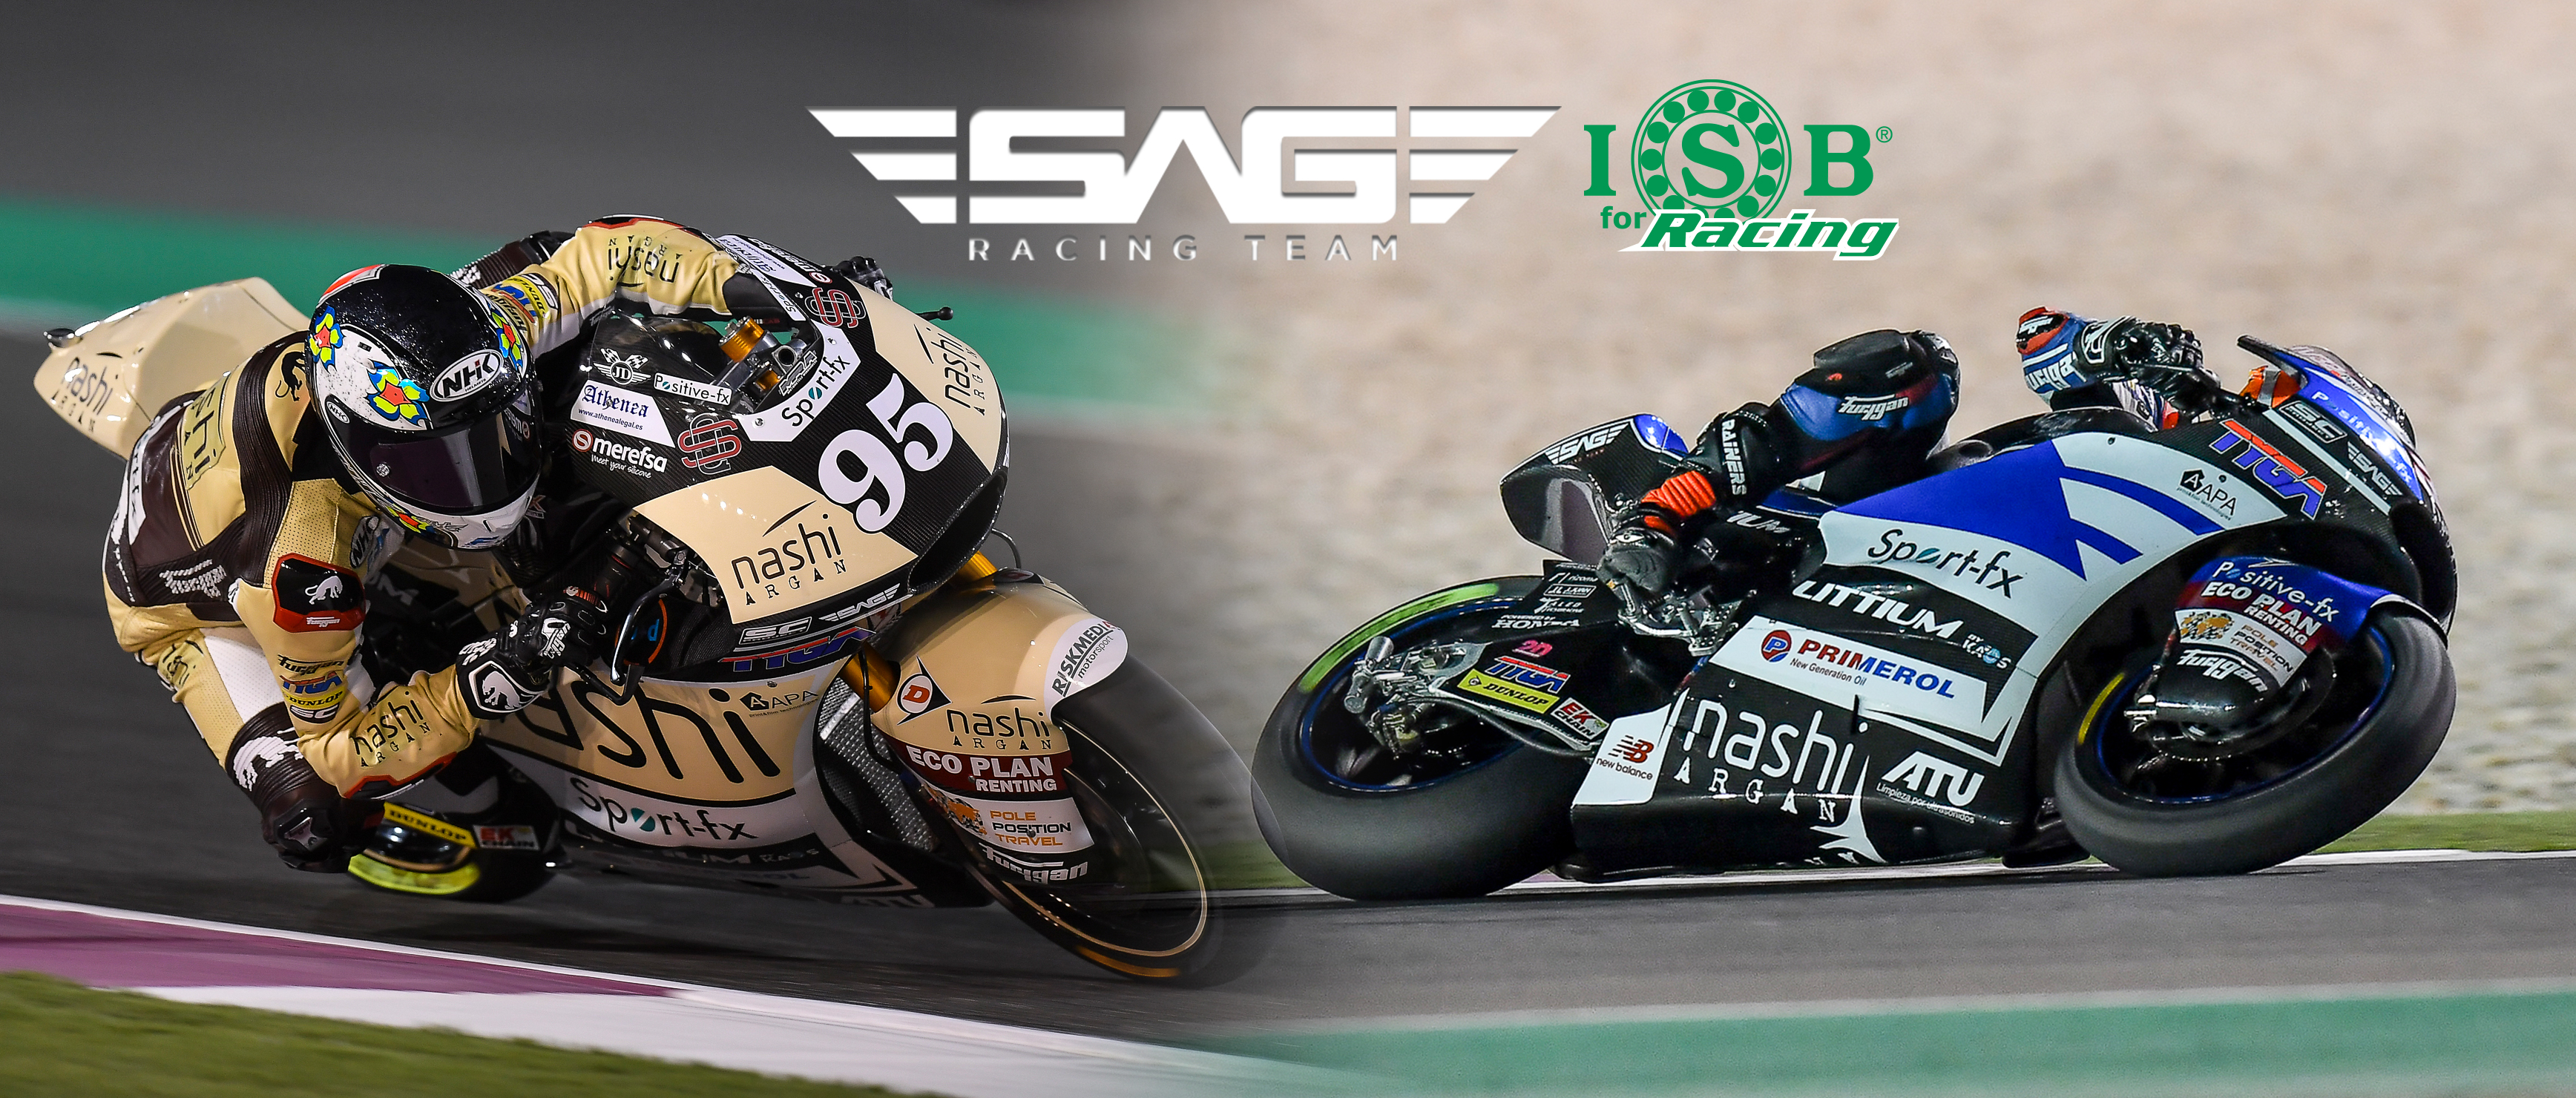 sag-raciong-team-qatar